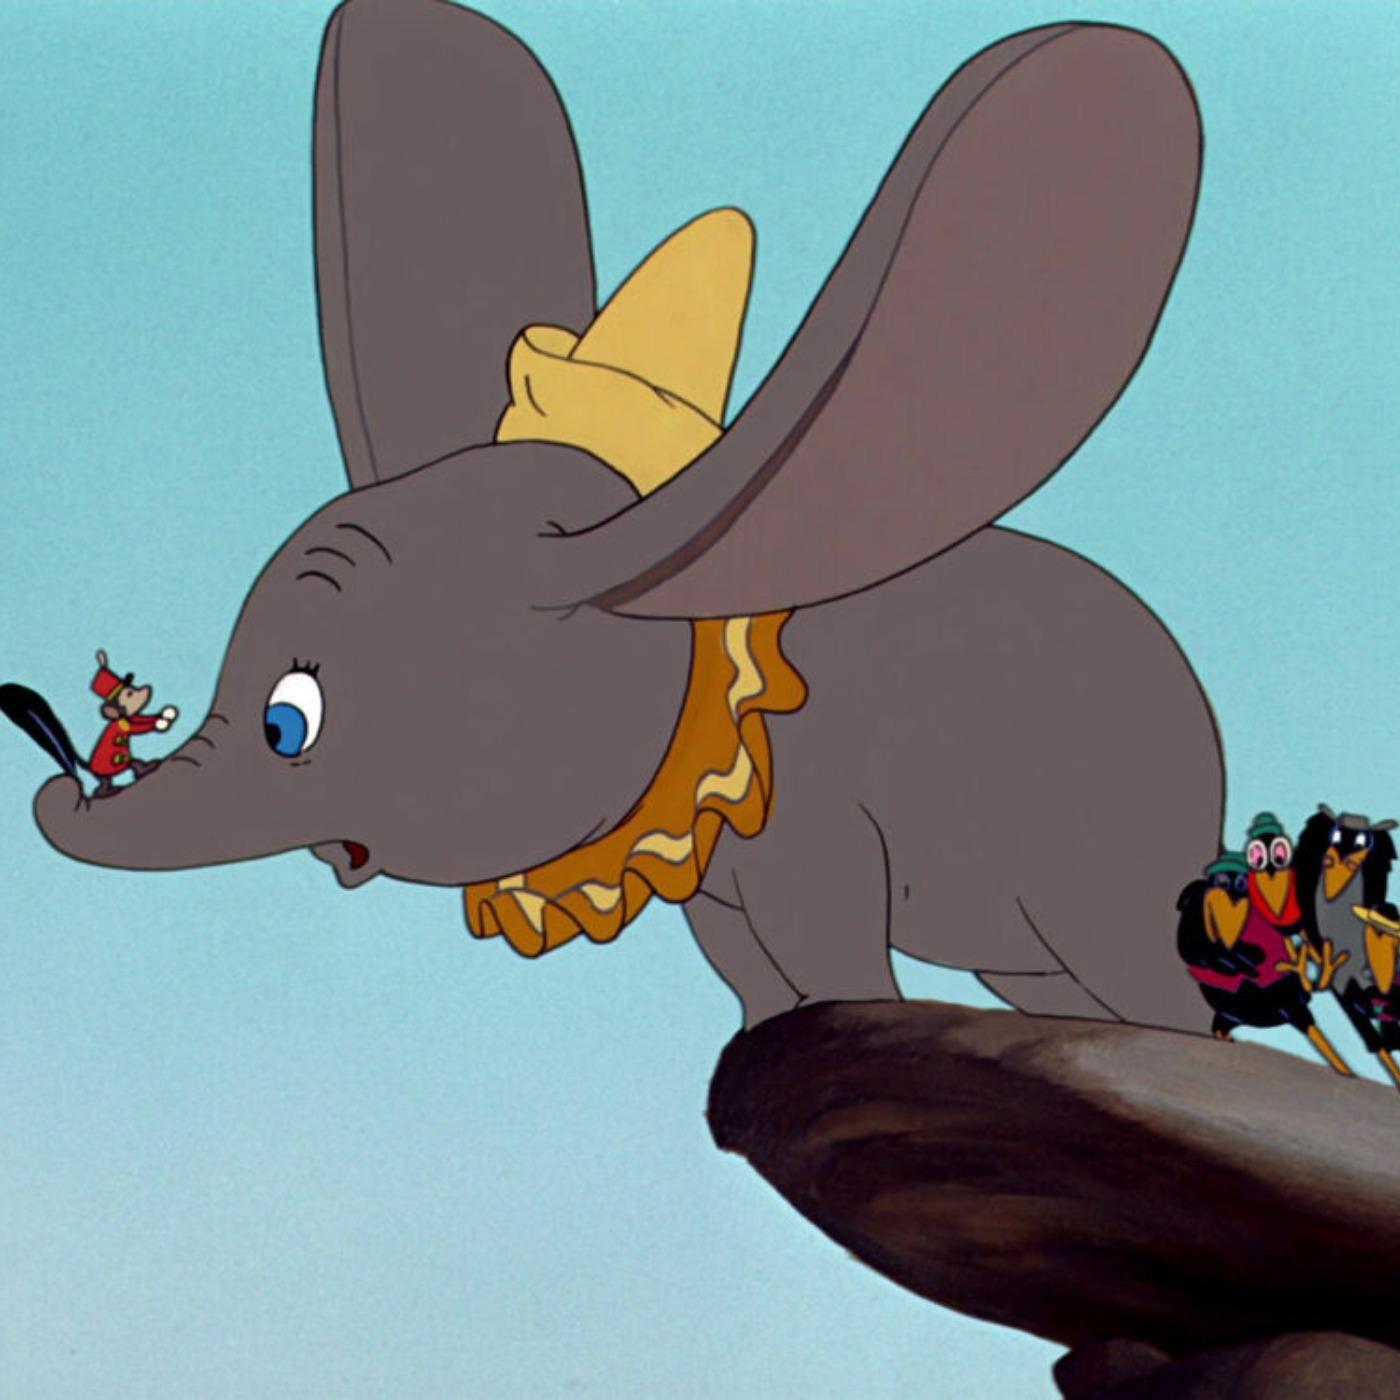 Dumbo Takes Flight